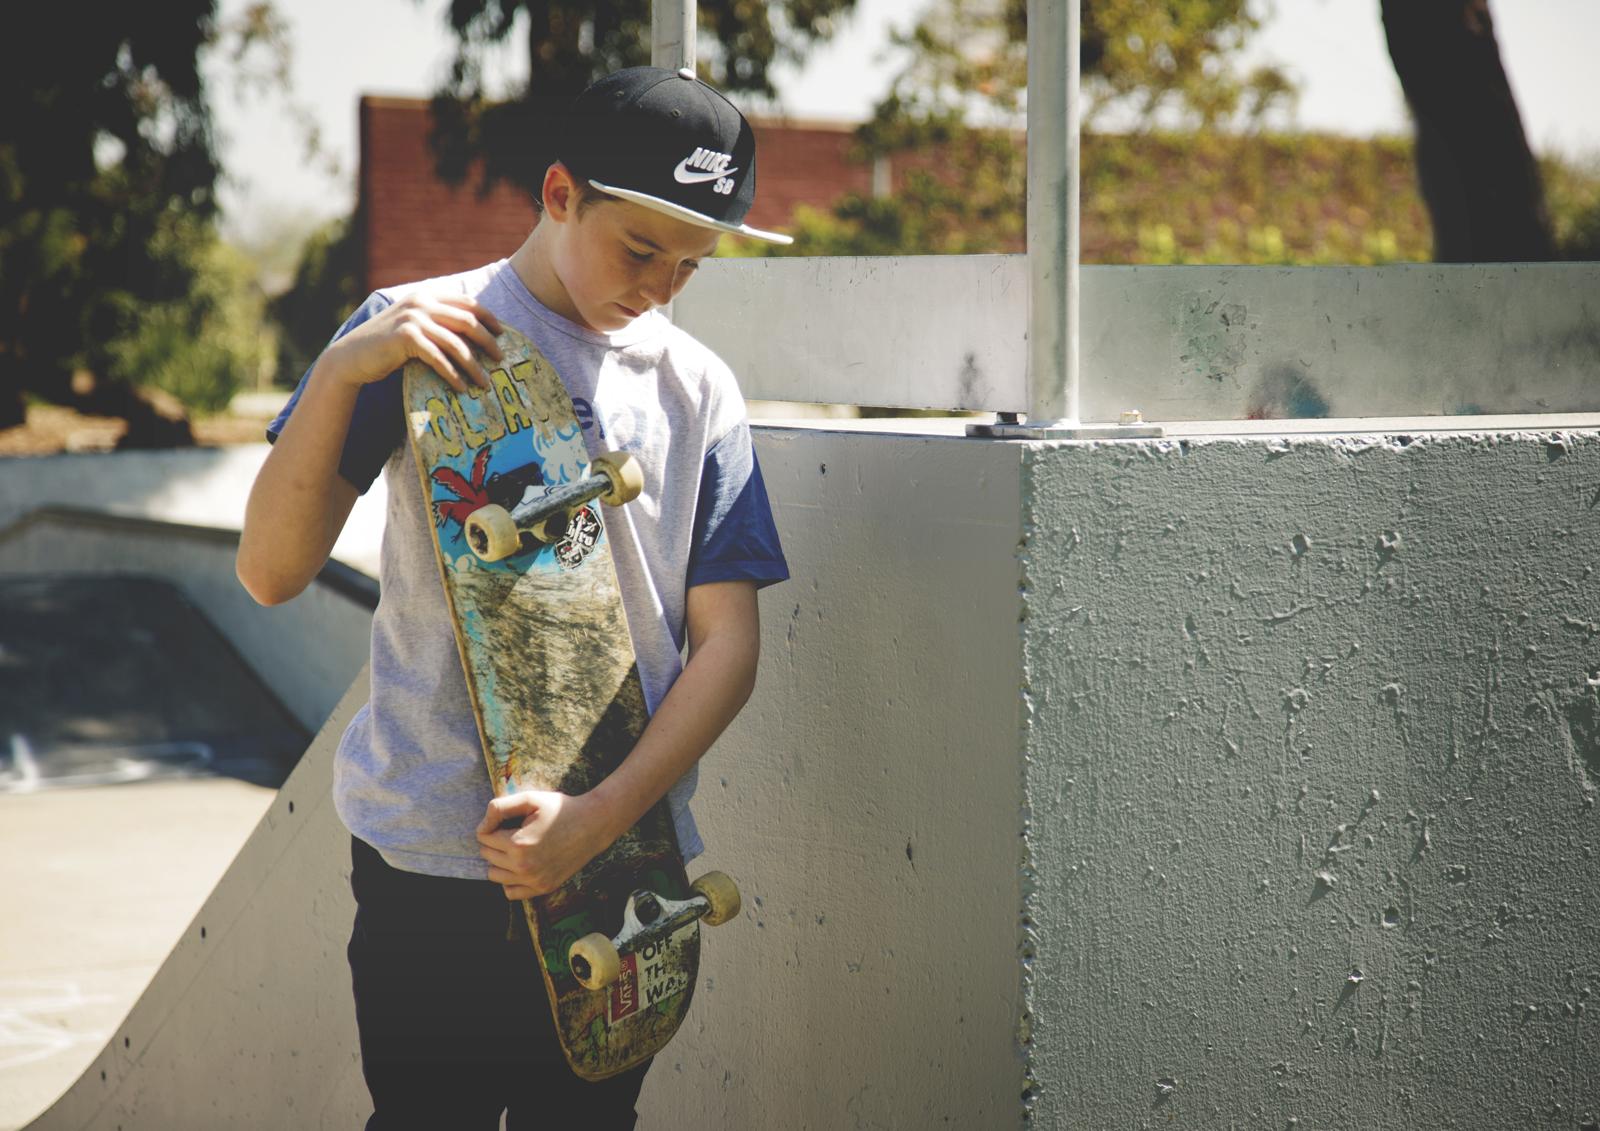 Tween boy photo shoot at skatepark!b